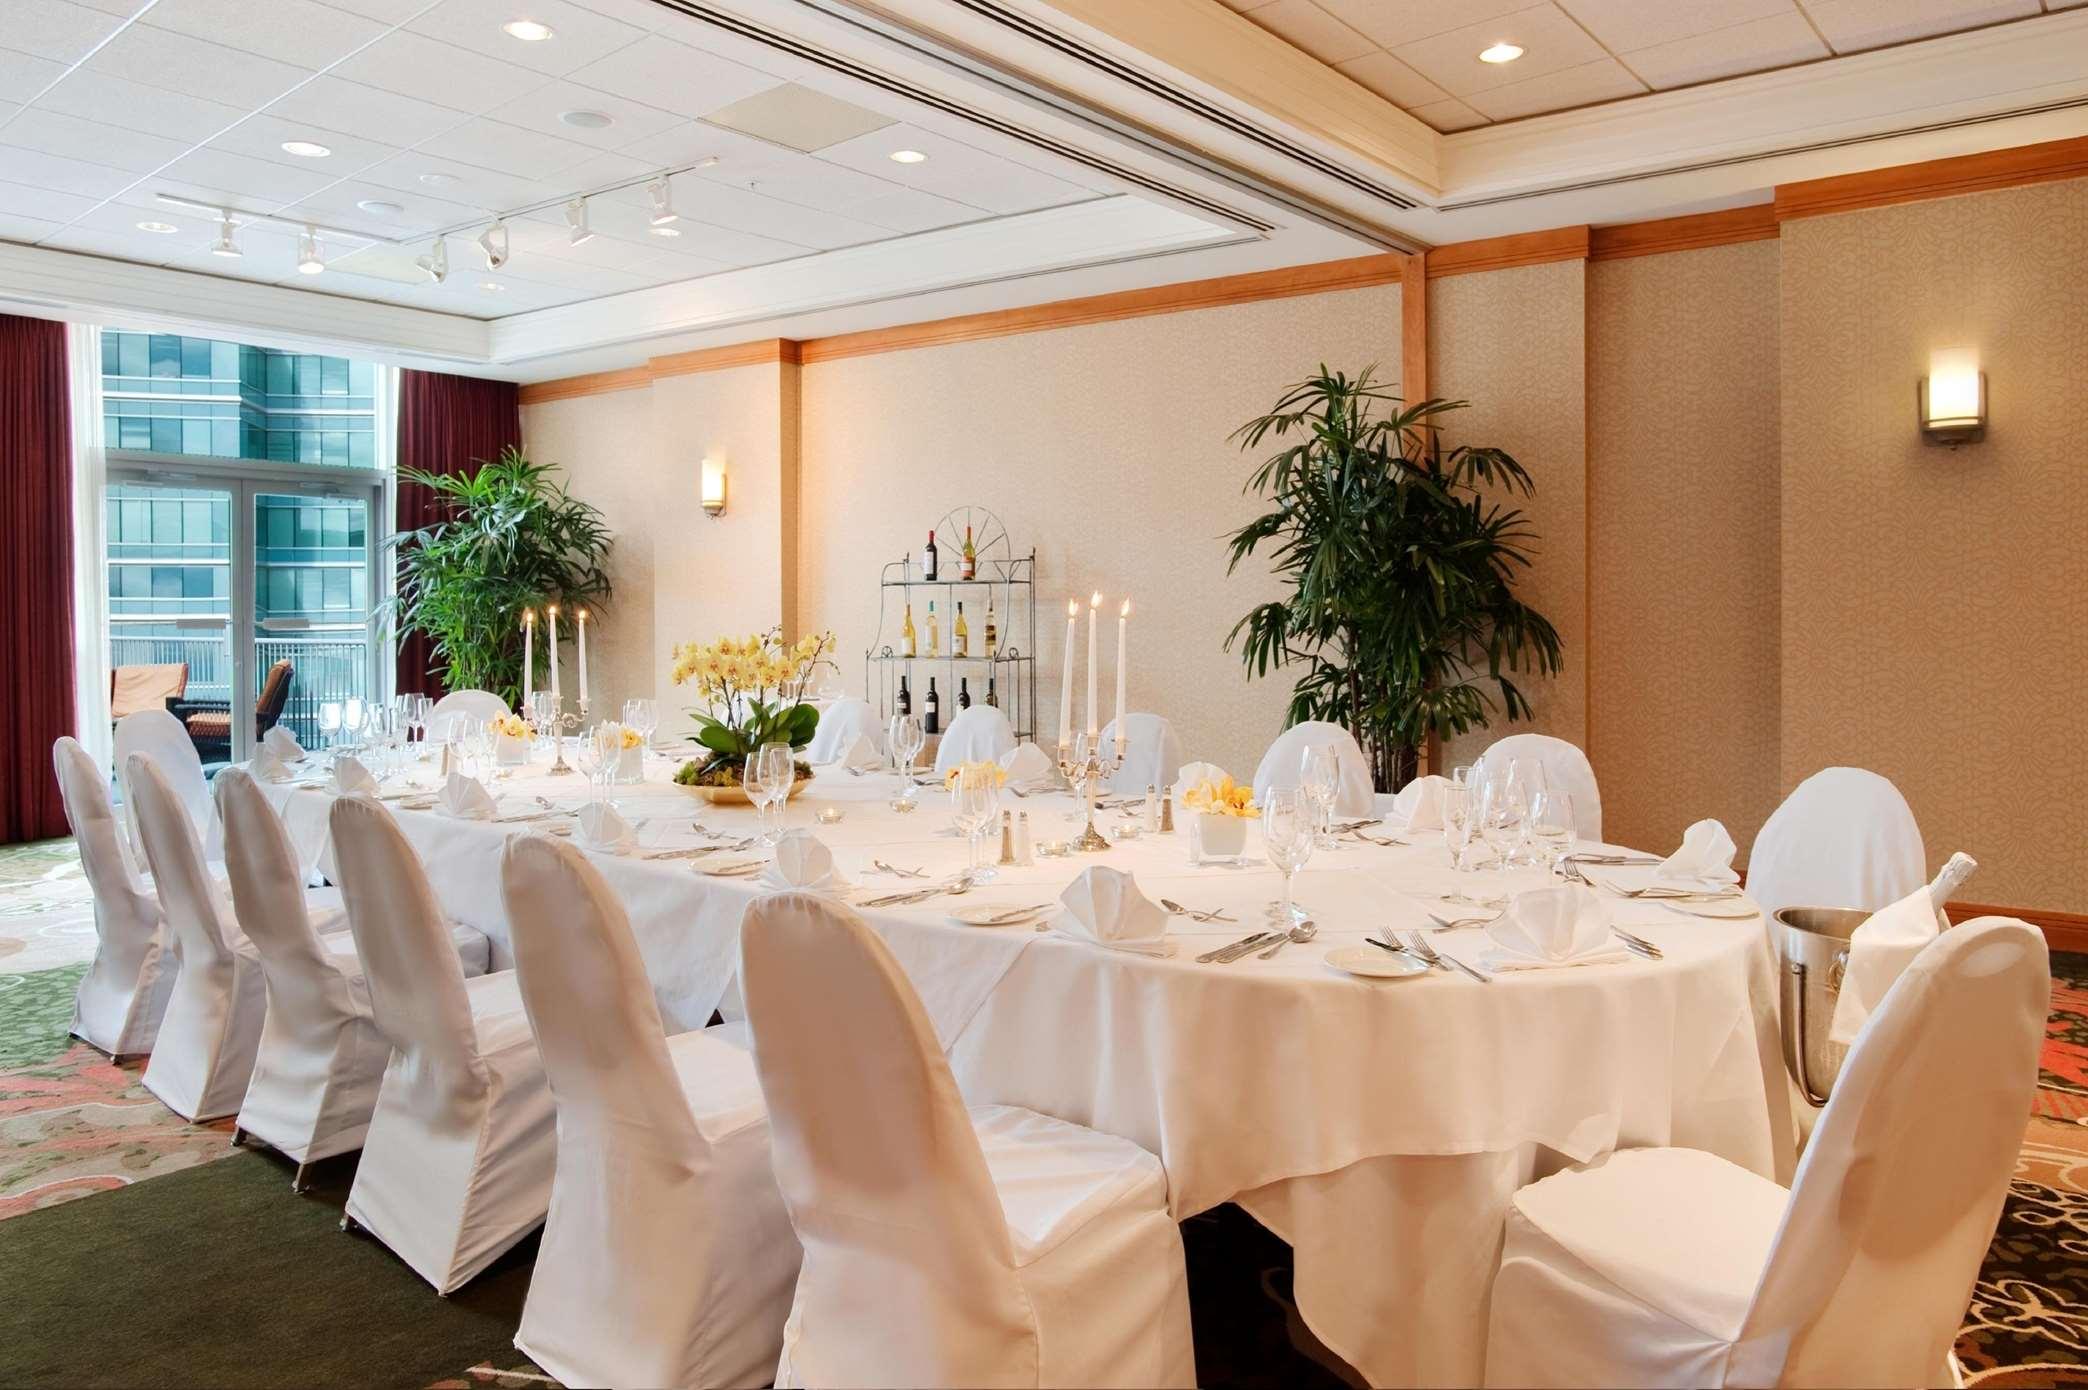 Hilton Vancouver Metrotown in Burnaby: Waterford Room